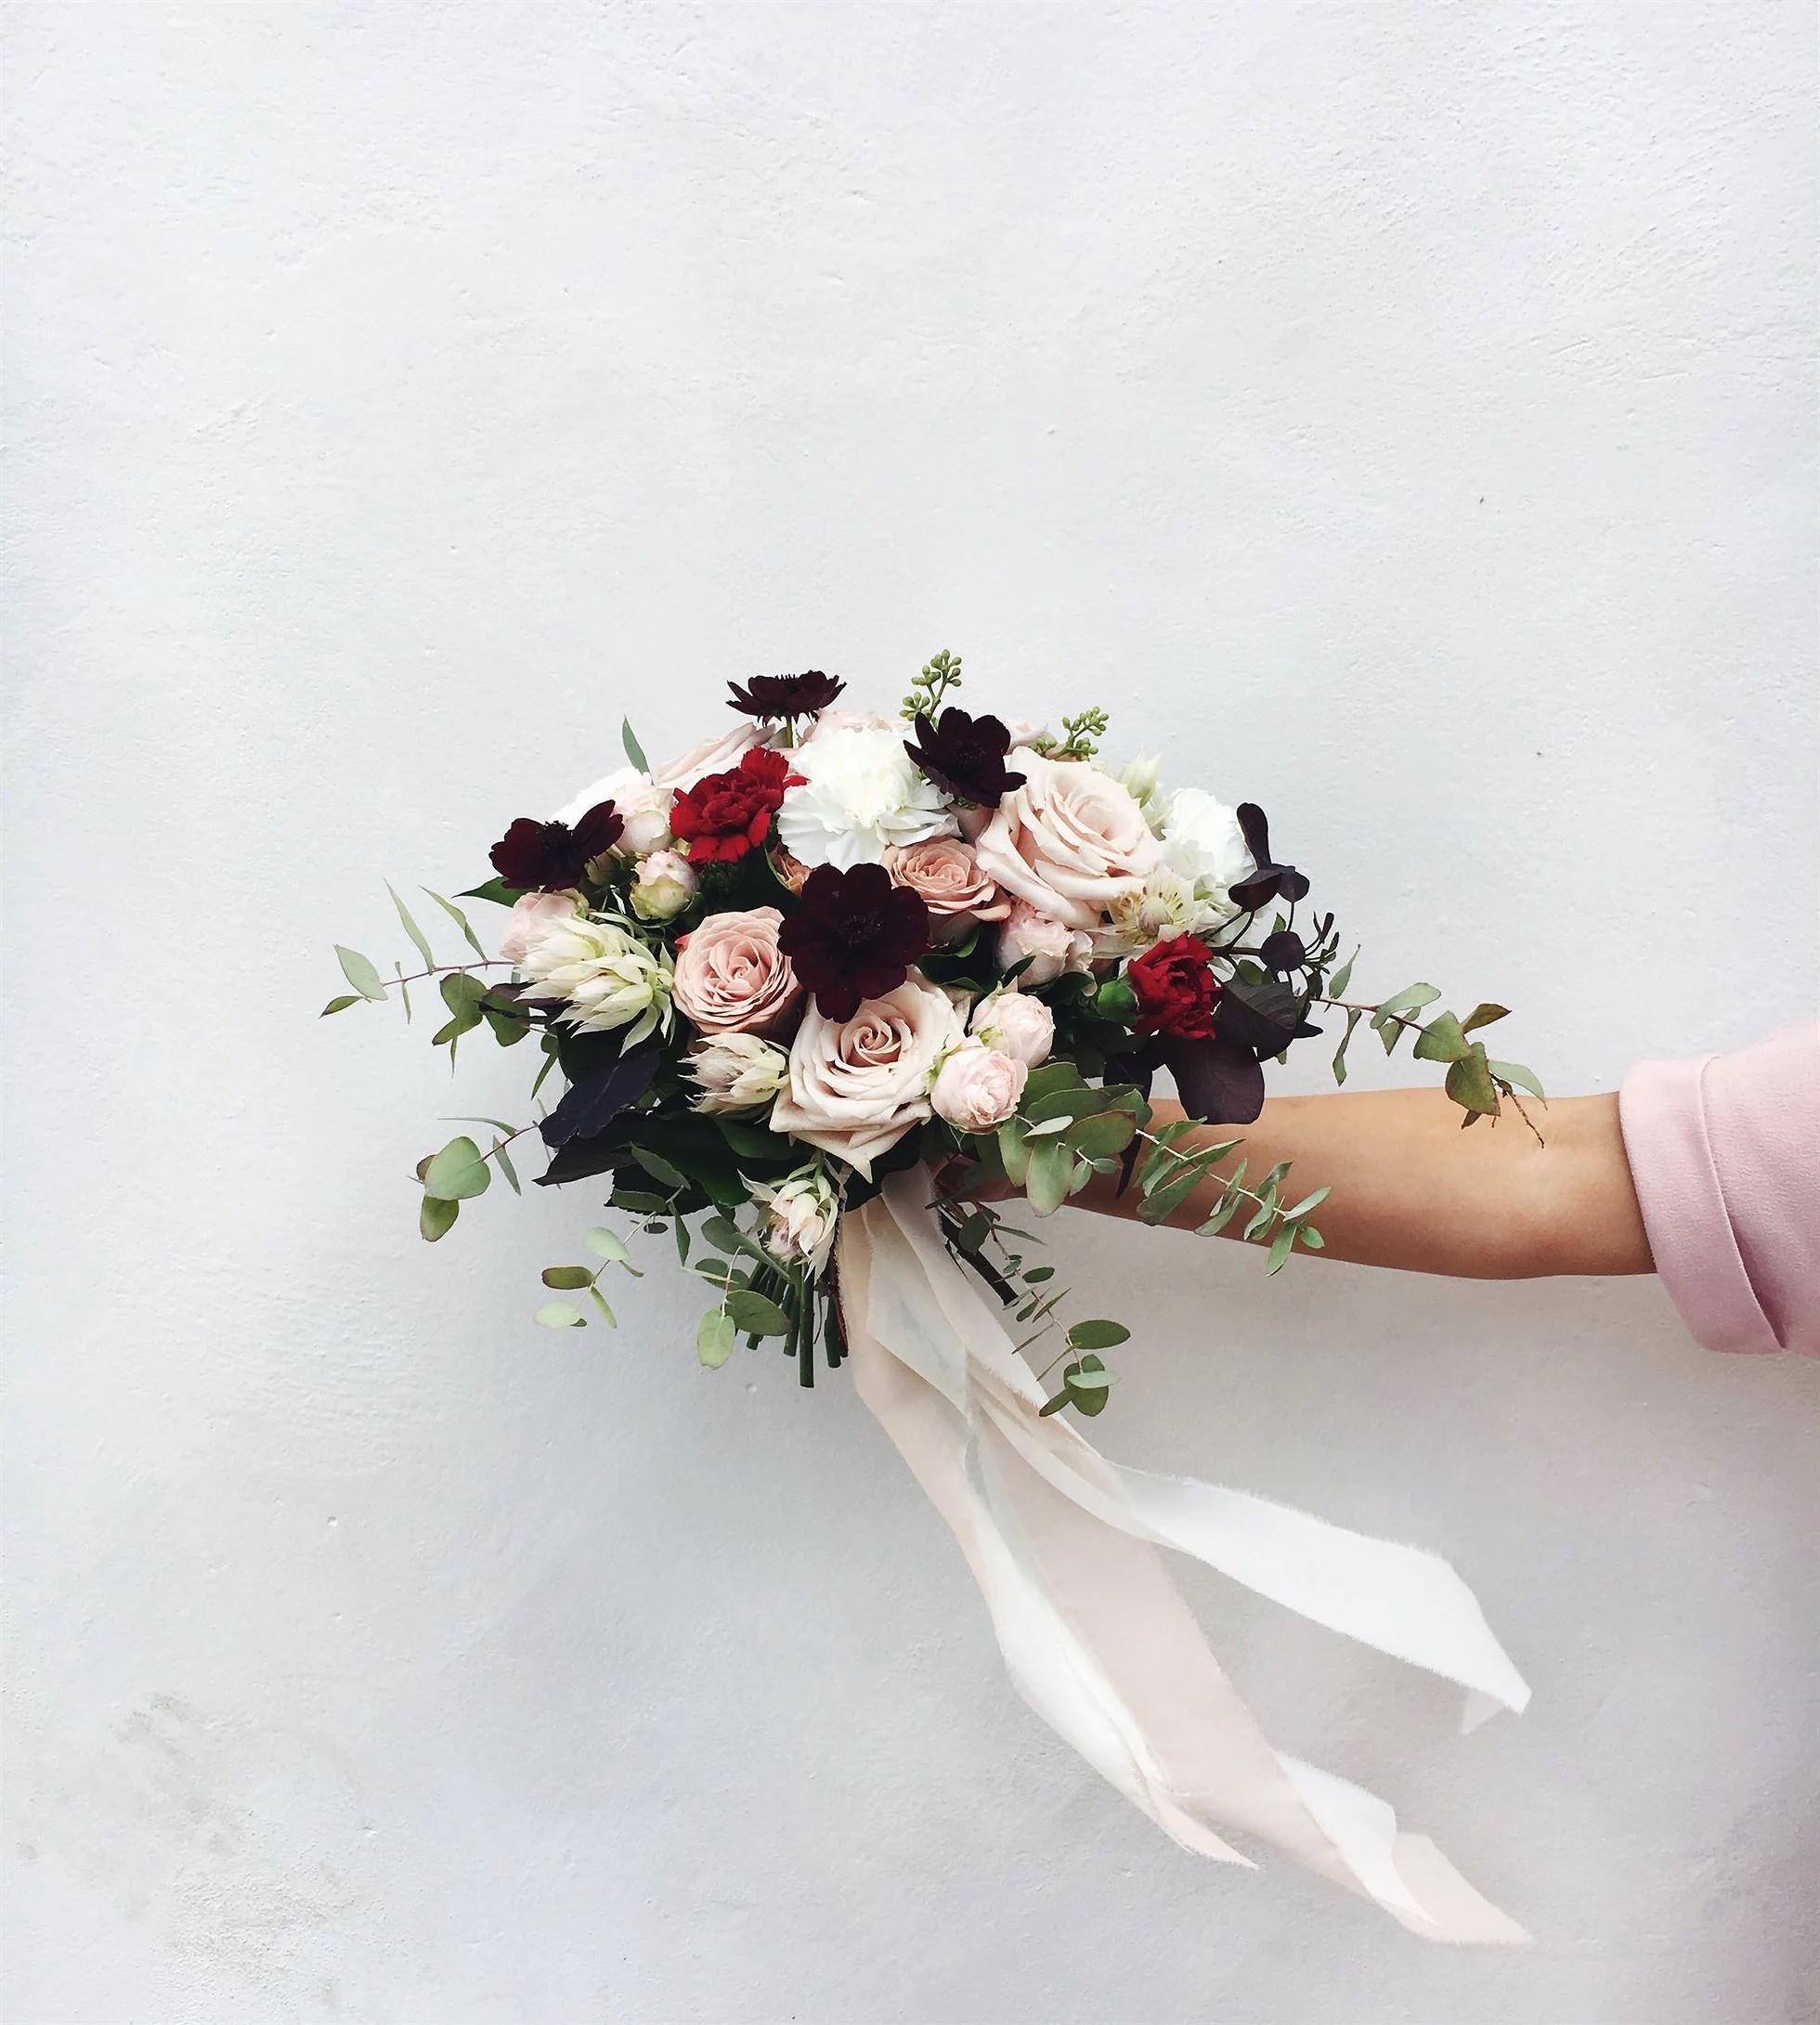 WEDDING SEASON - CHECK!